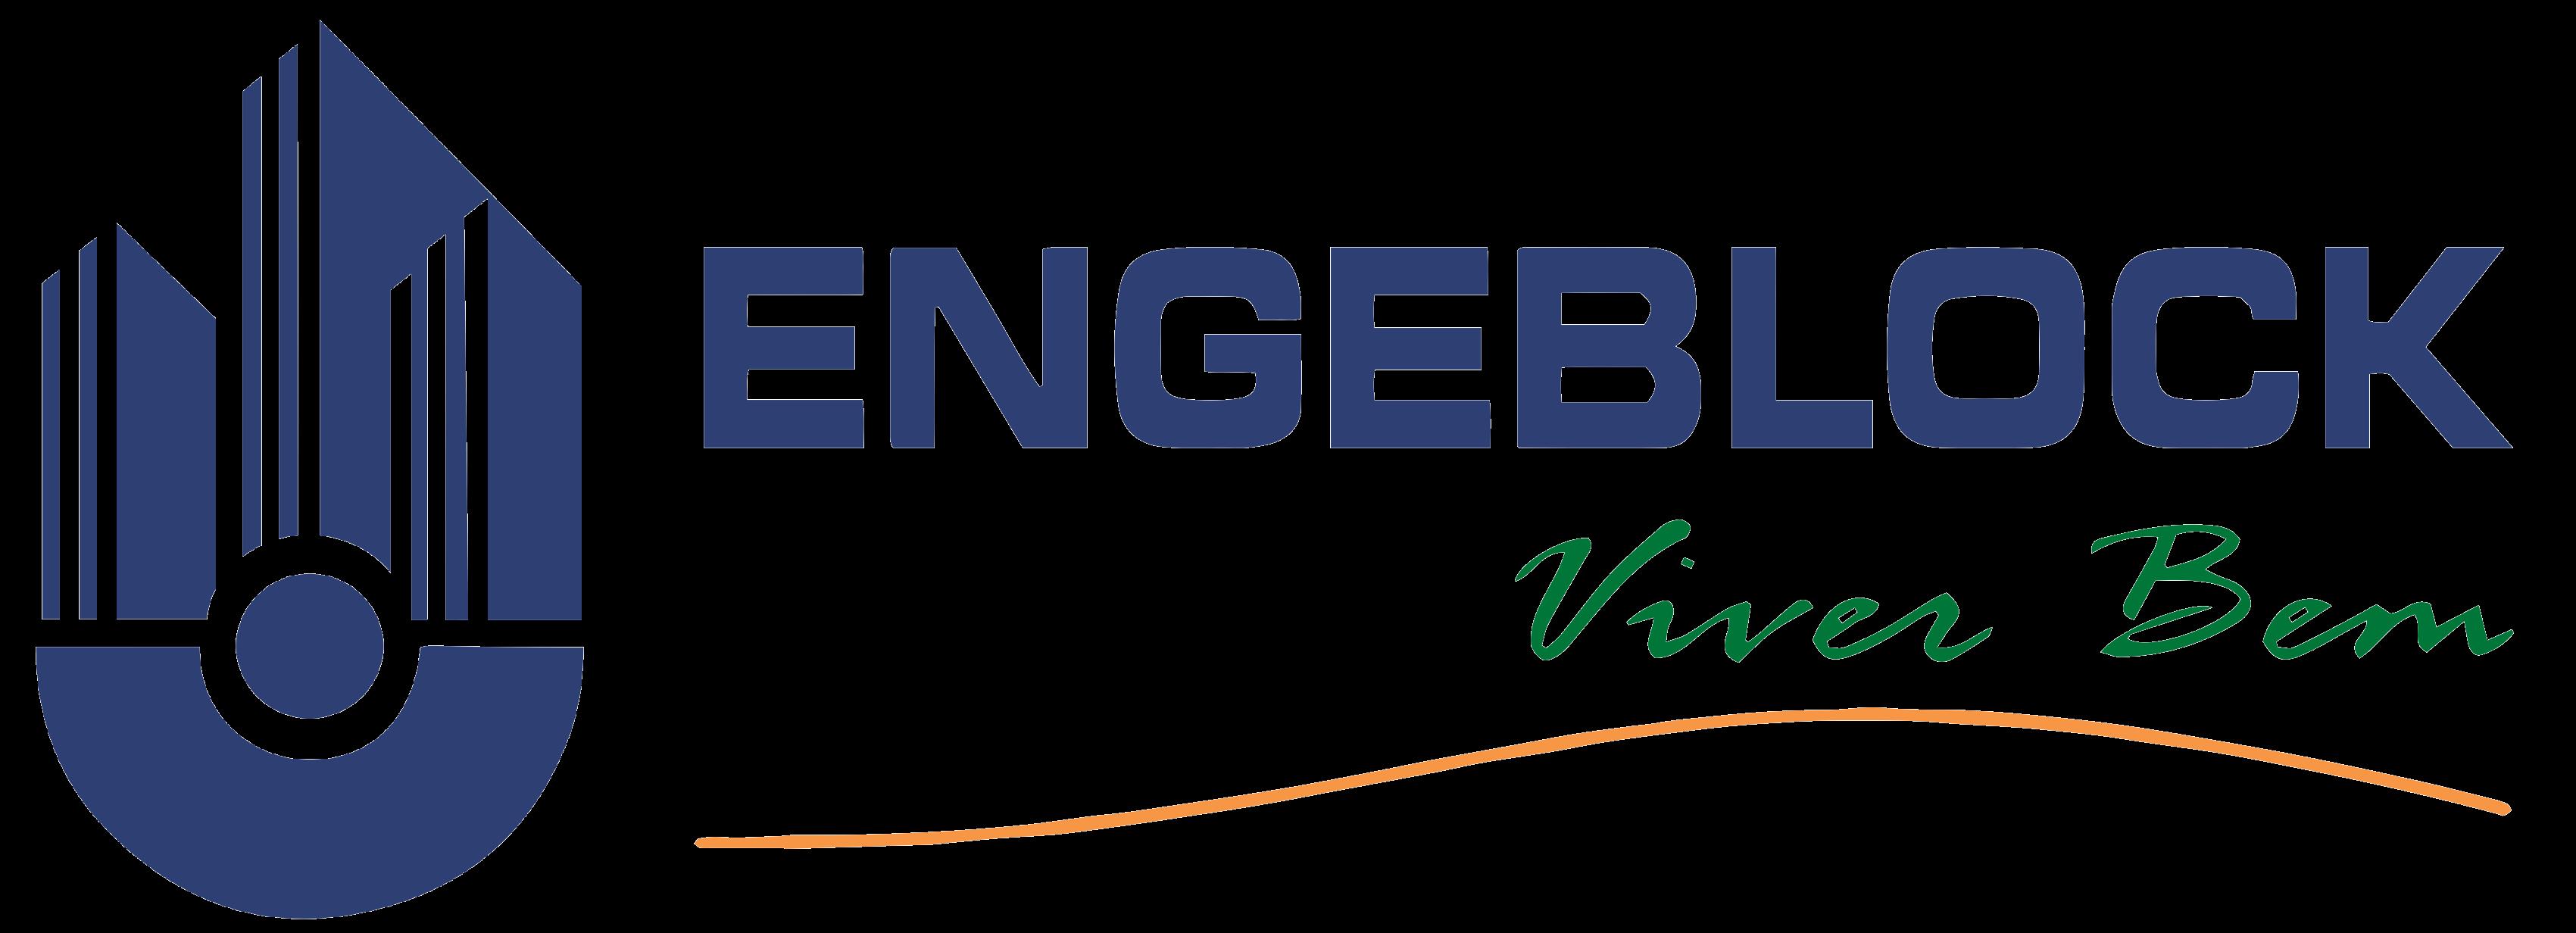 Engeblock - Viver Bem